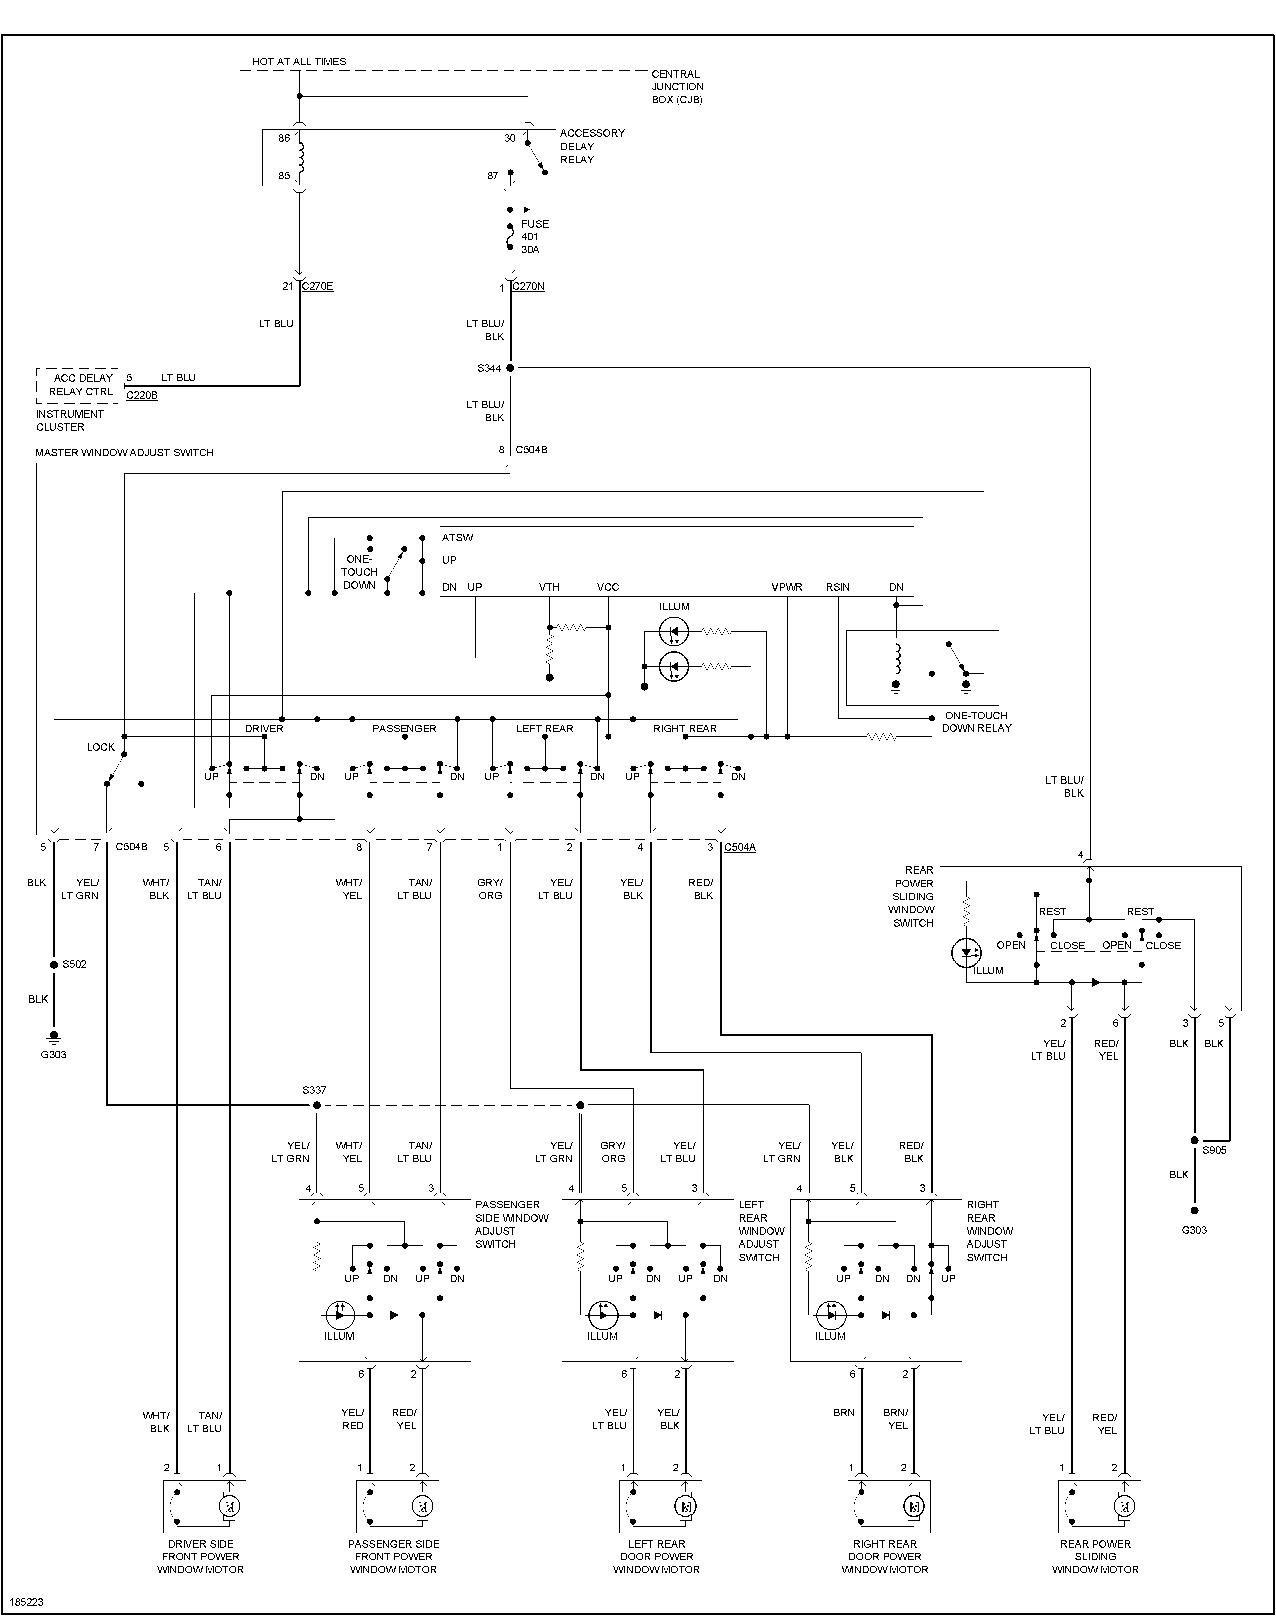 2005 F150 Window Motor Wiring Diagram - Wiring Diagram Text plunge-river -  plunge-river.albergoristorantecanzo.it | 2005 Gmc Window Wiring Diagrams Free |  | plunge-river.albergoristorantecanzo.it